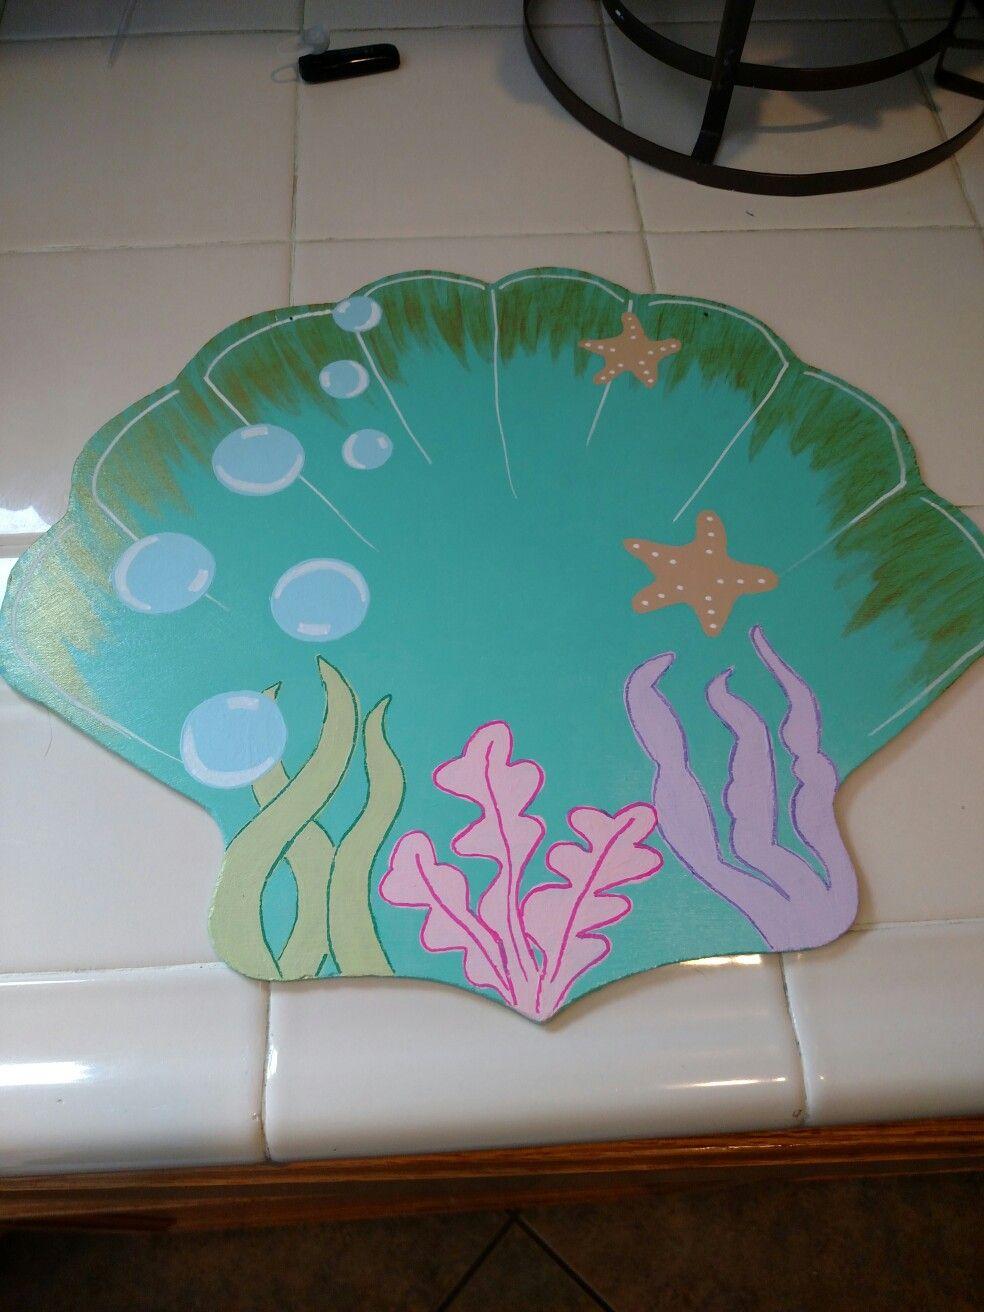 Diy mermaid decor from dollar tree clamshell mermaid